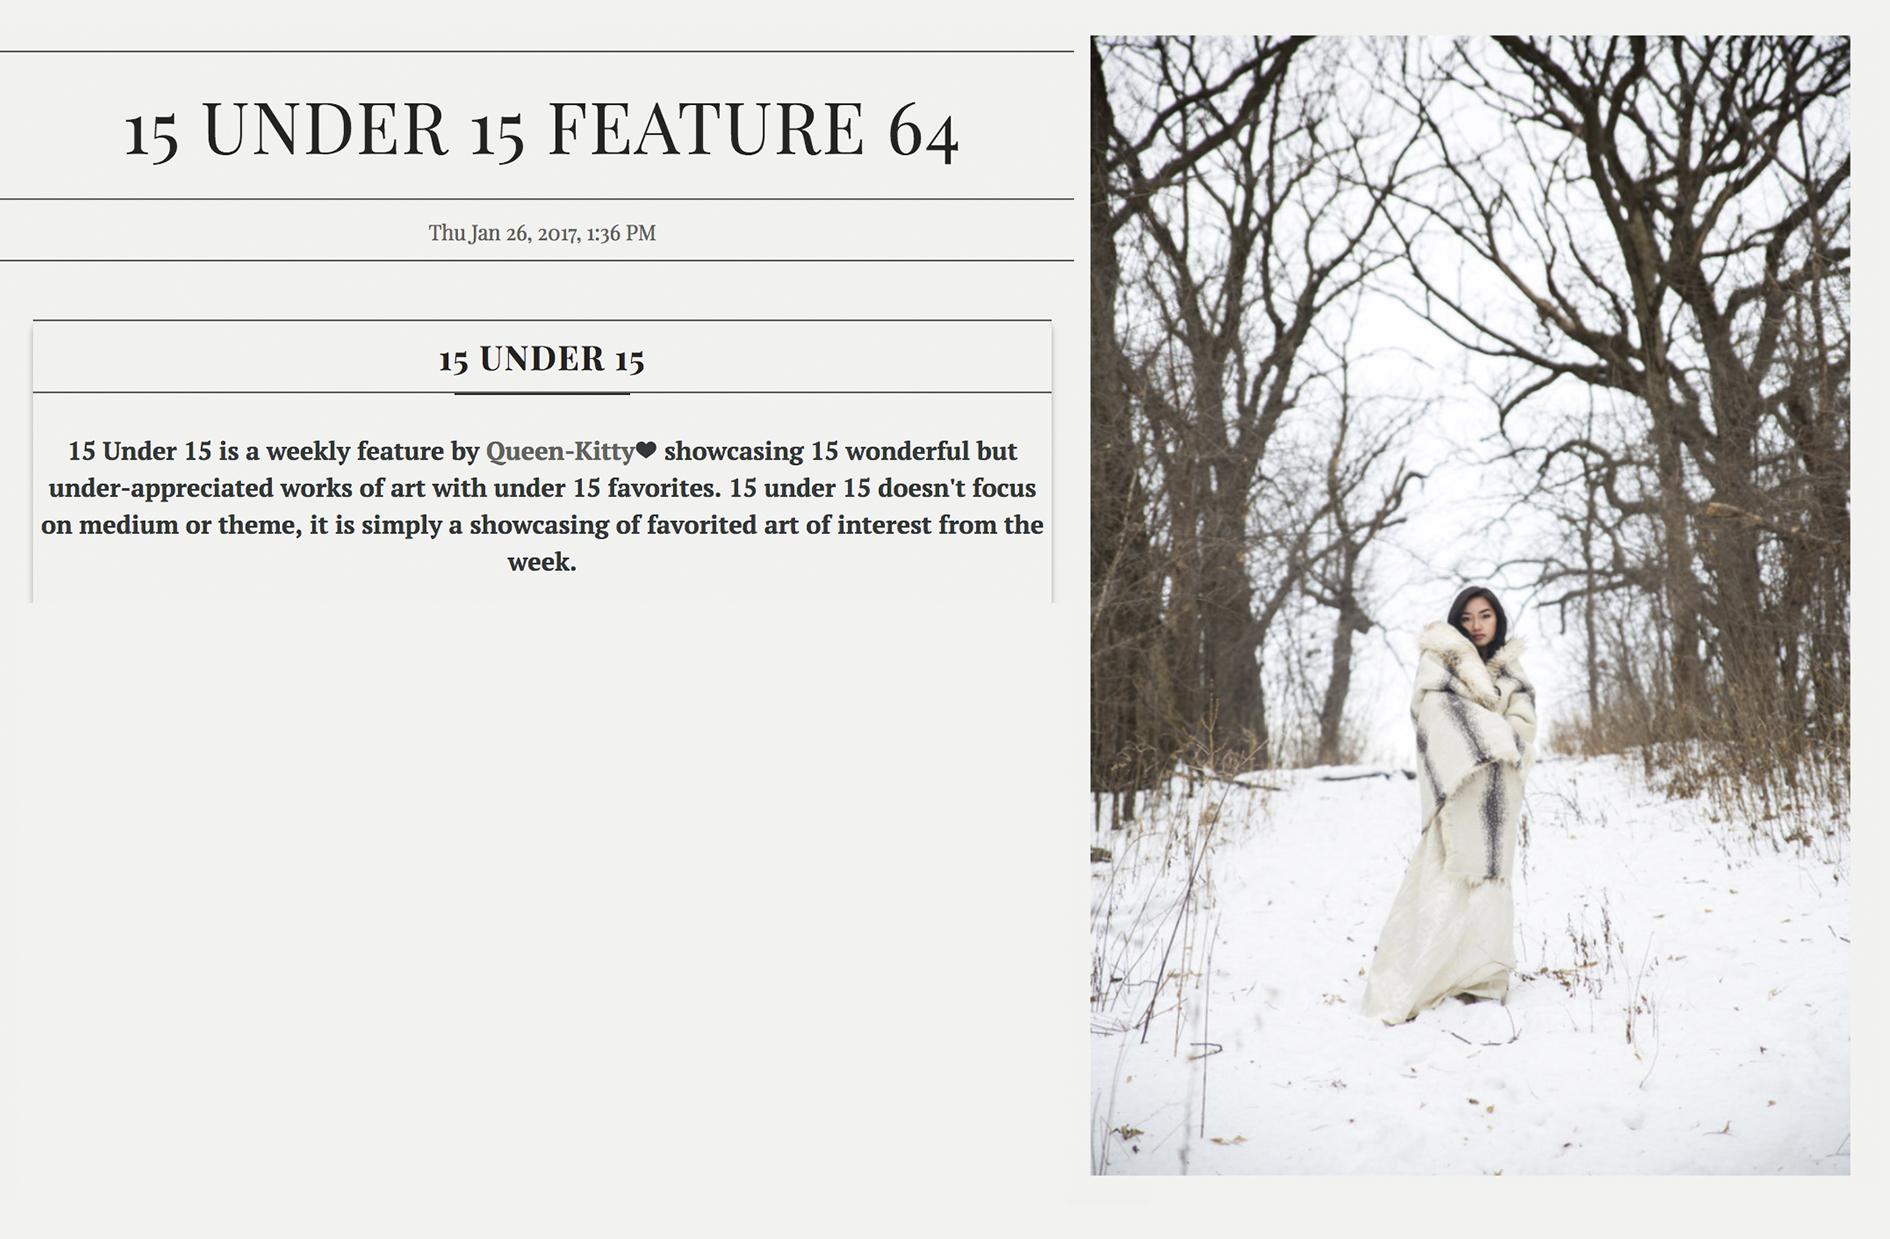 15 Under 15 Feature #64 by Ashley Holloway on Deviant Art 2017  http://queen-kitty.deviantart.com/journal/15-UNDER-15-FEATURE-64-659765506